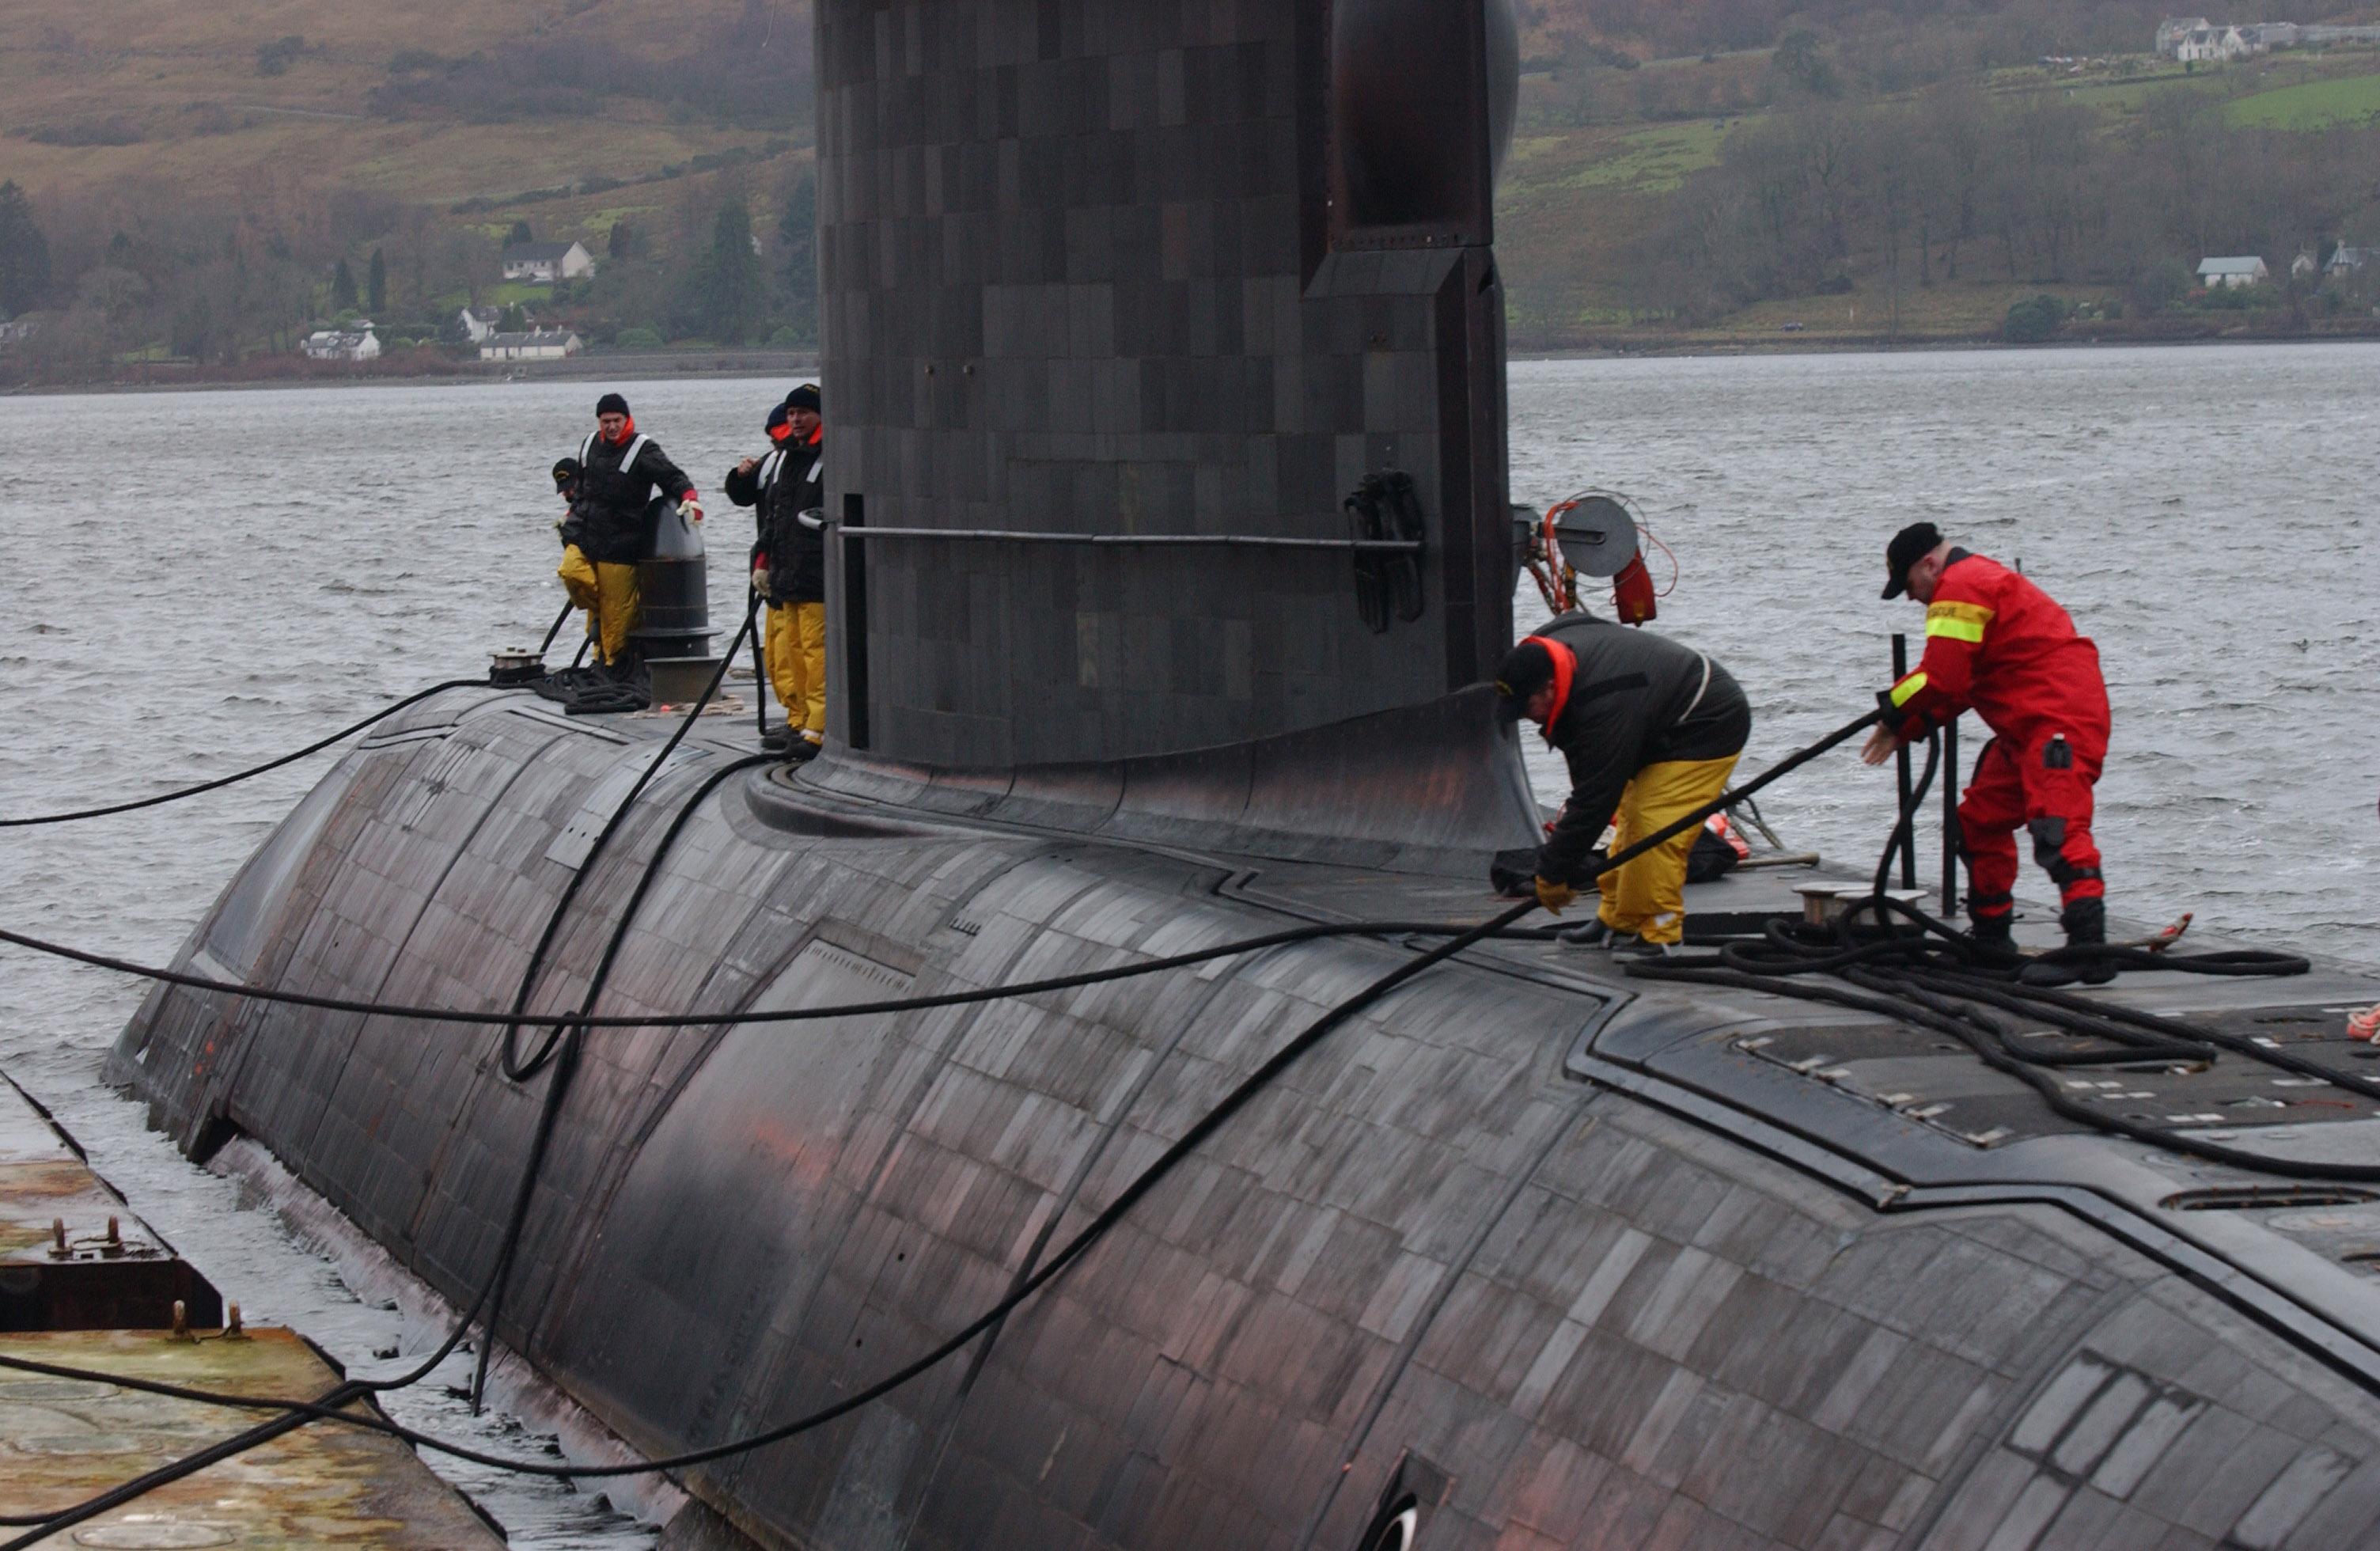 Crew members of HMCS Chicoutimi